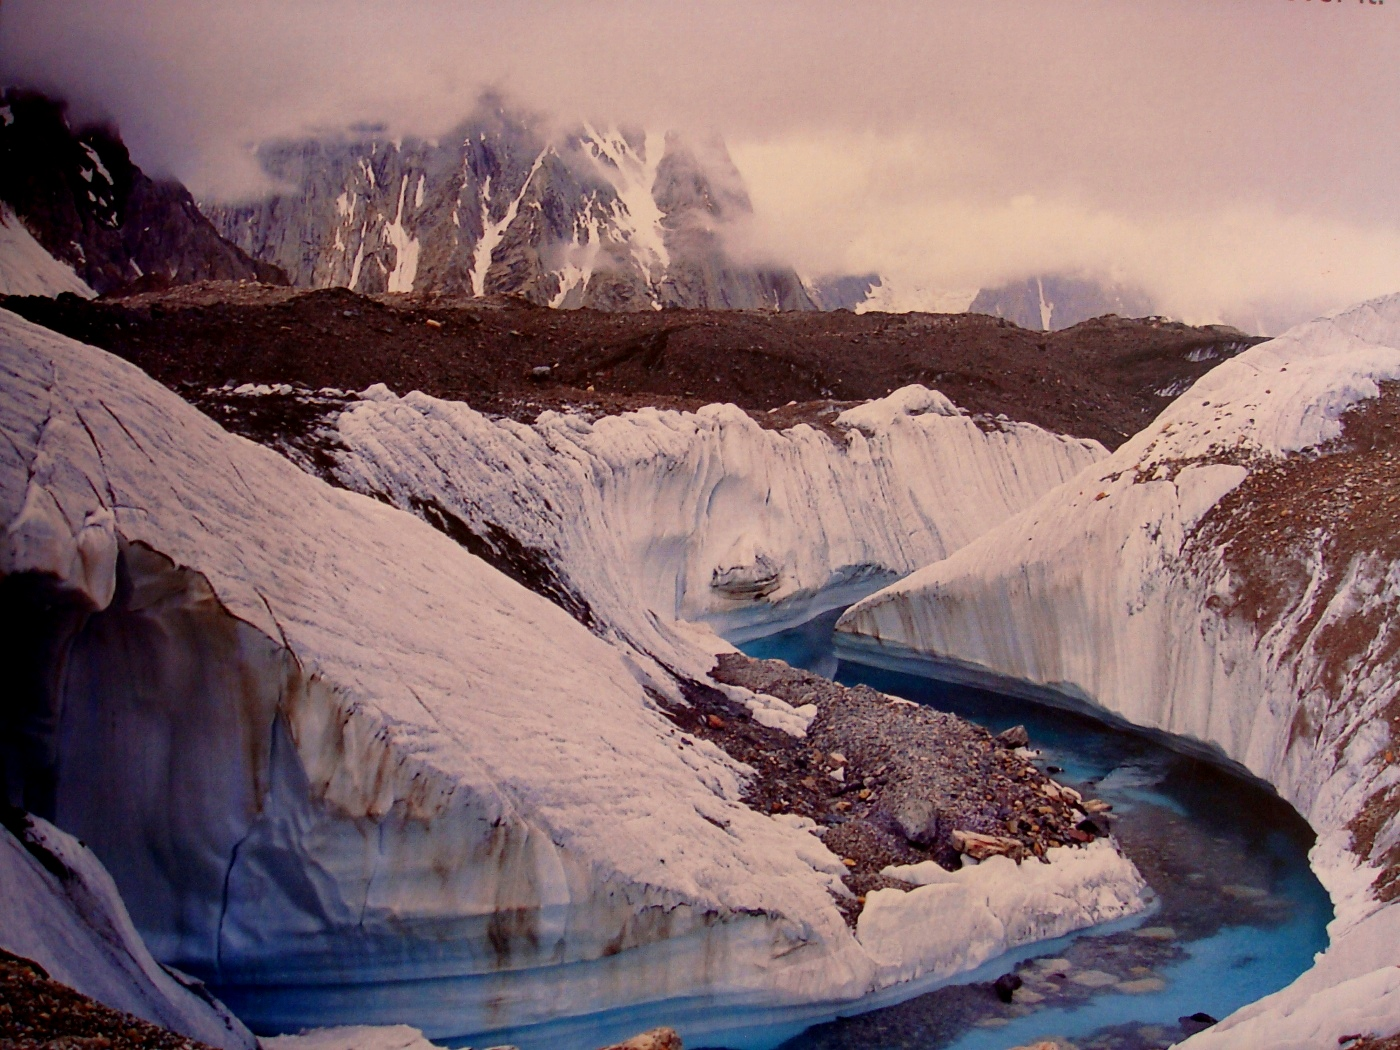 Karakoram hills, Hills, Ice, Landscape, Mountains, HQ Photo